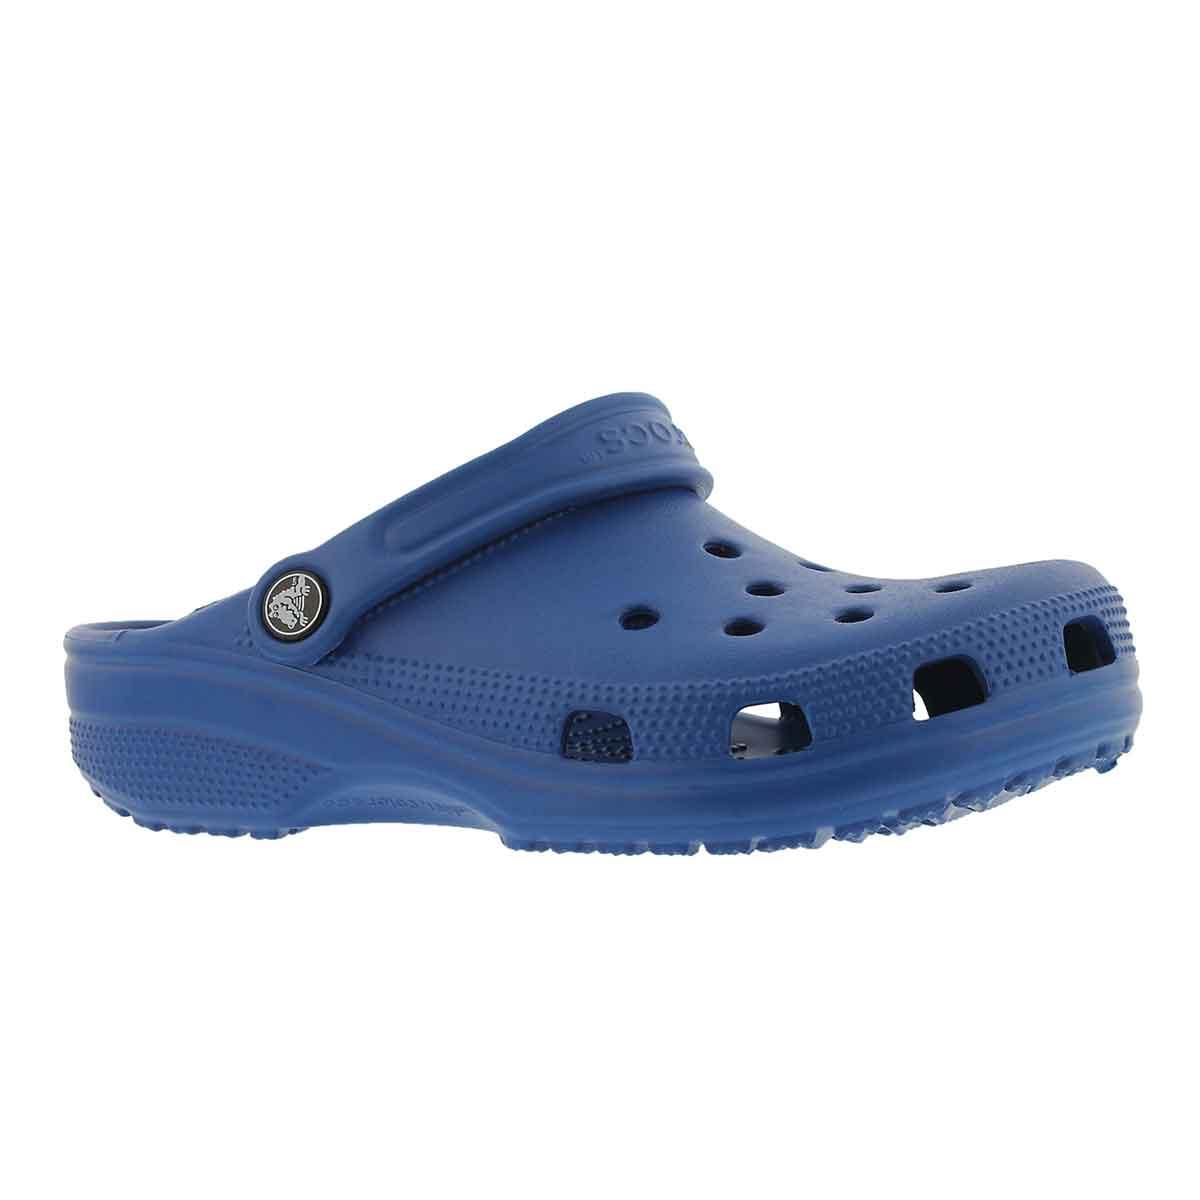 Women's CLASSIC blue jean EVA comfort clogs